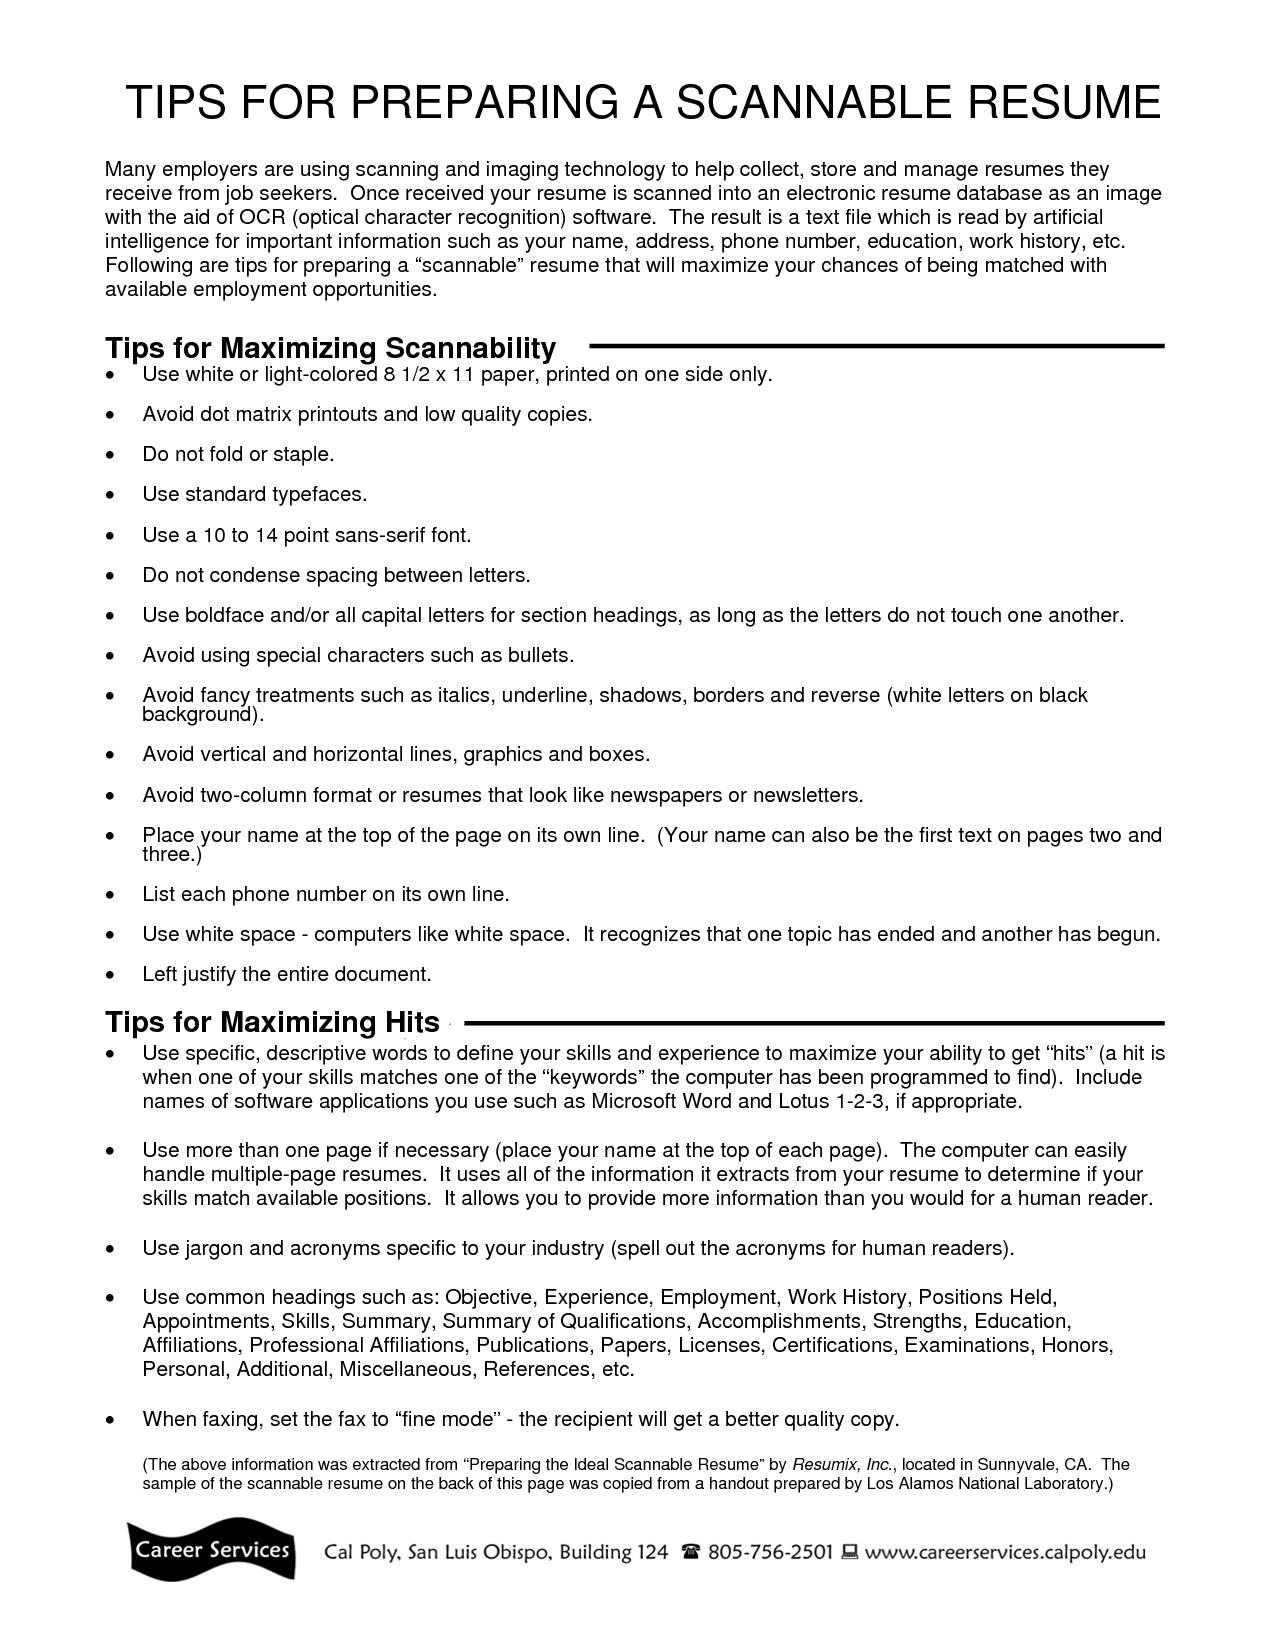 Best Scannable Resume Format Bongdaao Com Overused Words Resume Format Resume